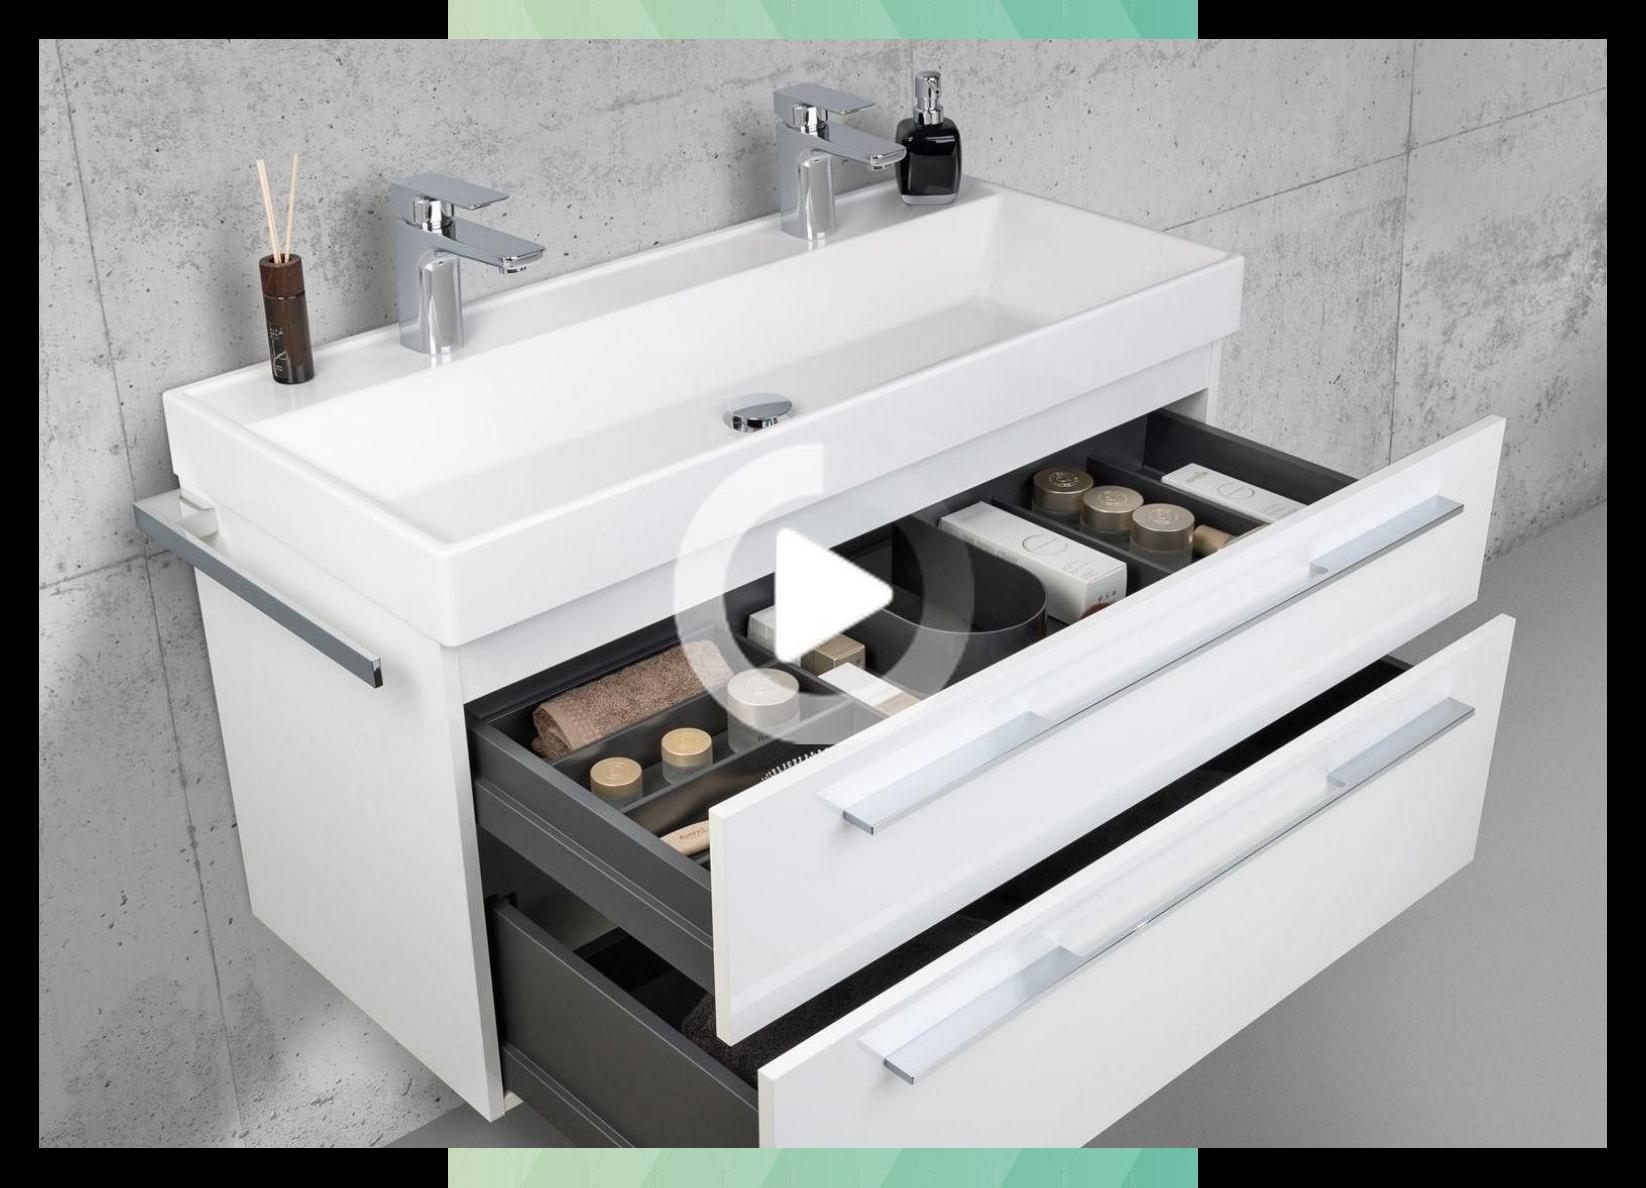 Meble Lazienkowe Set 100 Cm Podwojna Umywalka Z Szafka Zestaw Proznosc In 2020 Bathroom Furniture Sets Vanity Bathroom Furniture